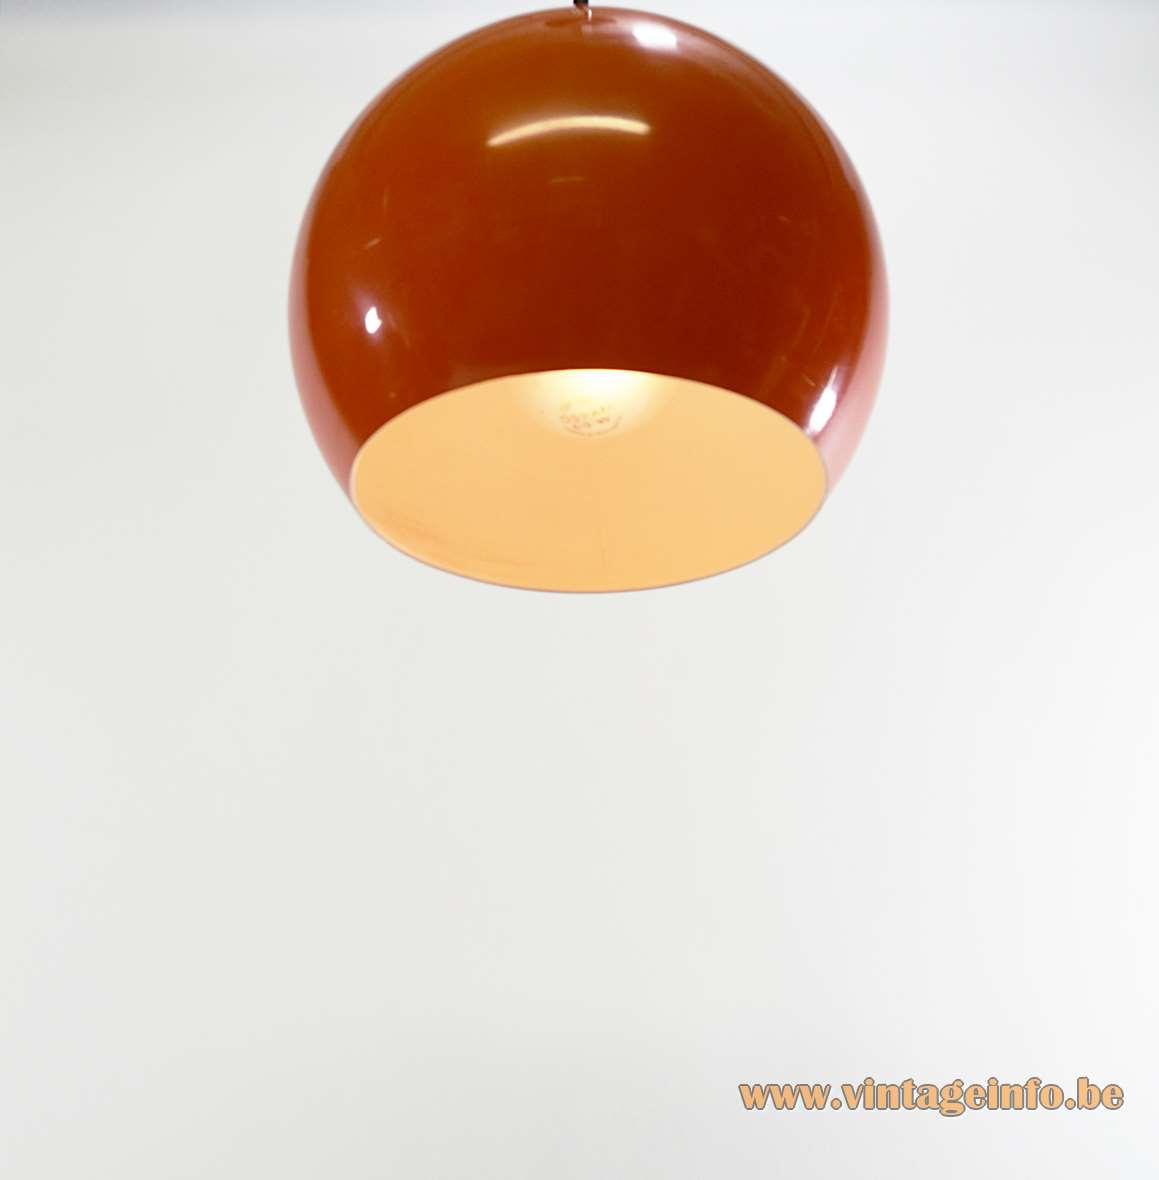 Eyeball Pendant Lamp orange globe light 5 perforations 1960s 1970s 1980s Massive Belgium MCM